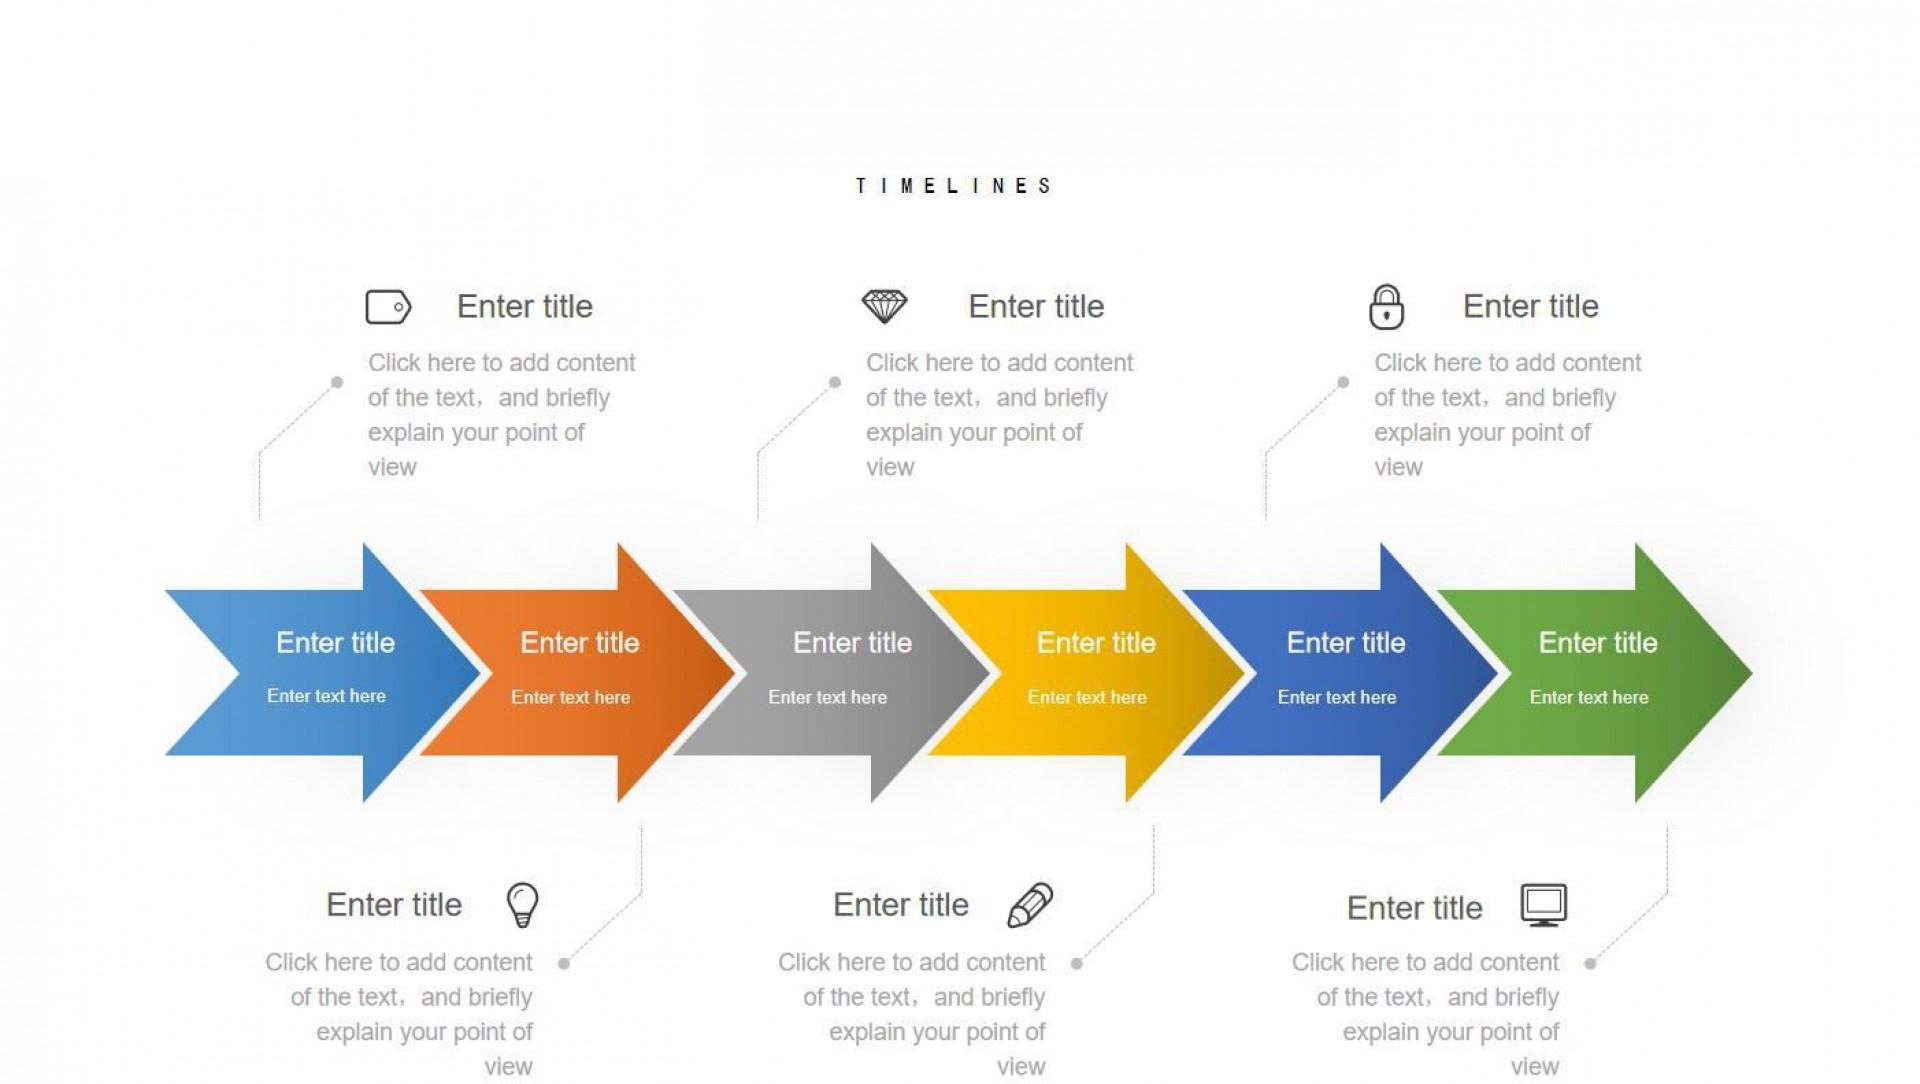 003 Astounding Timeline Presentation Template Free Download High Resolution 1920